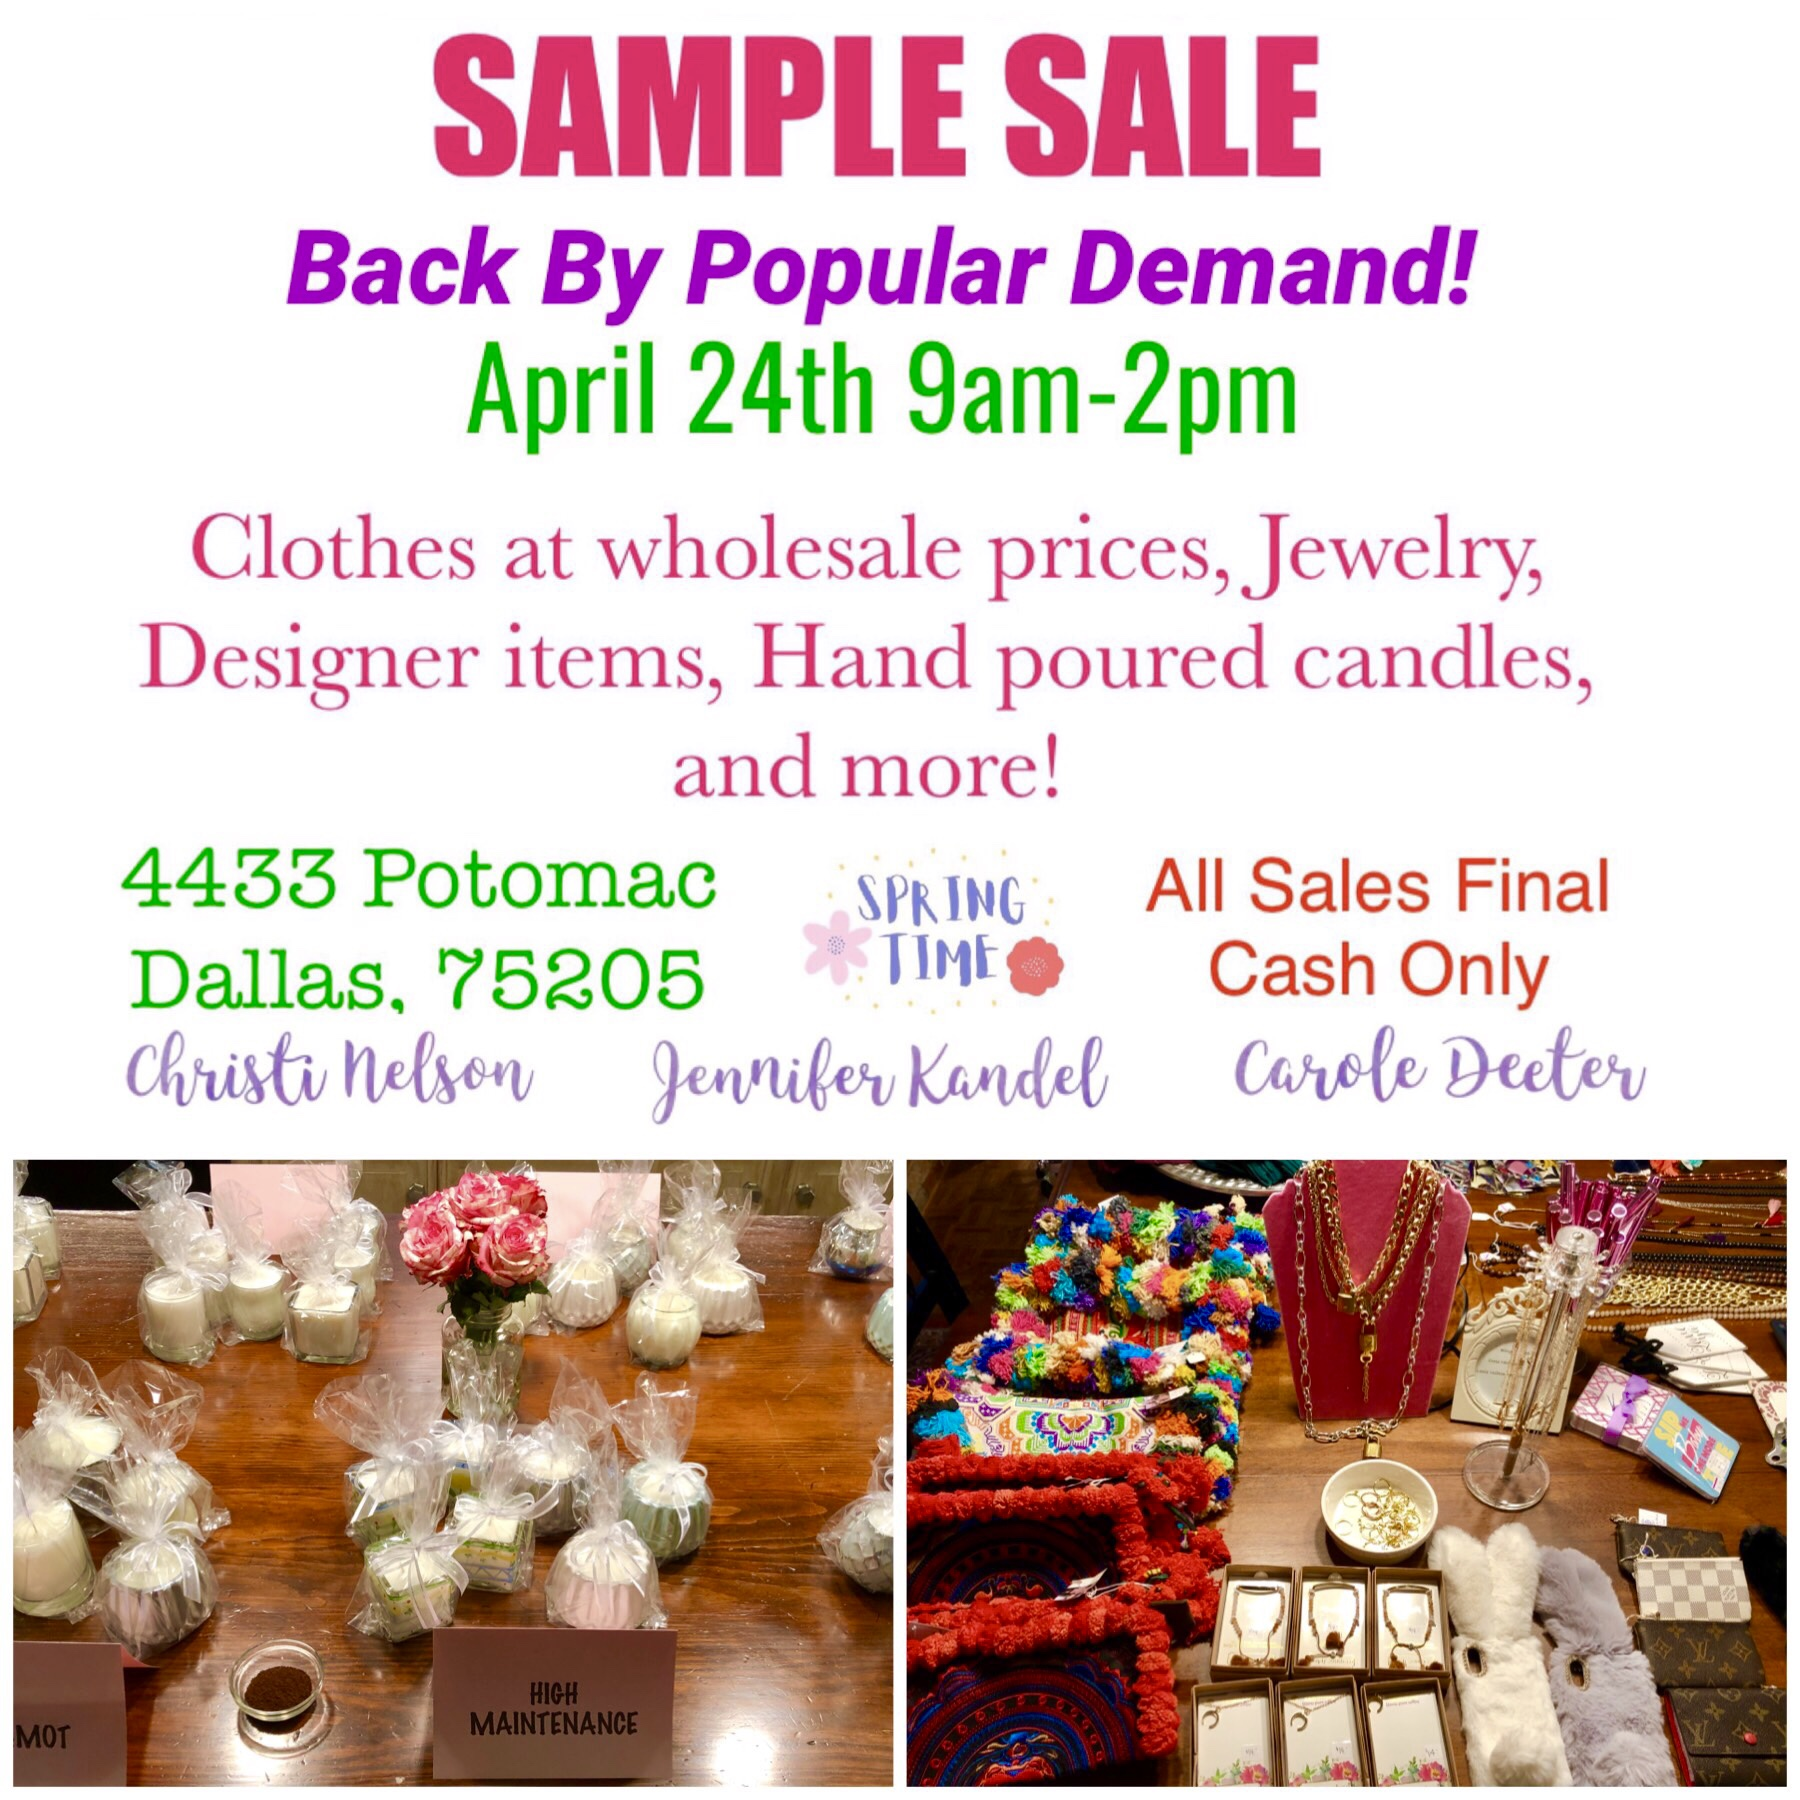 Sample Sale 4433 Potomac 4/24 9-2 – Park Cities People